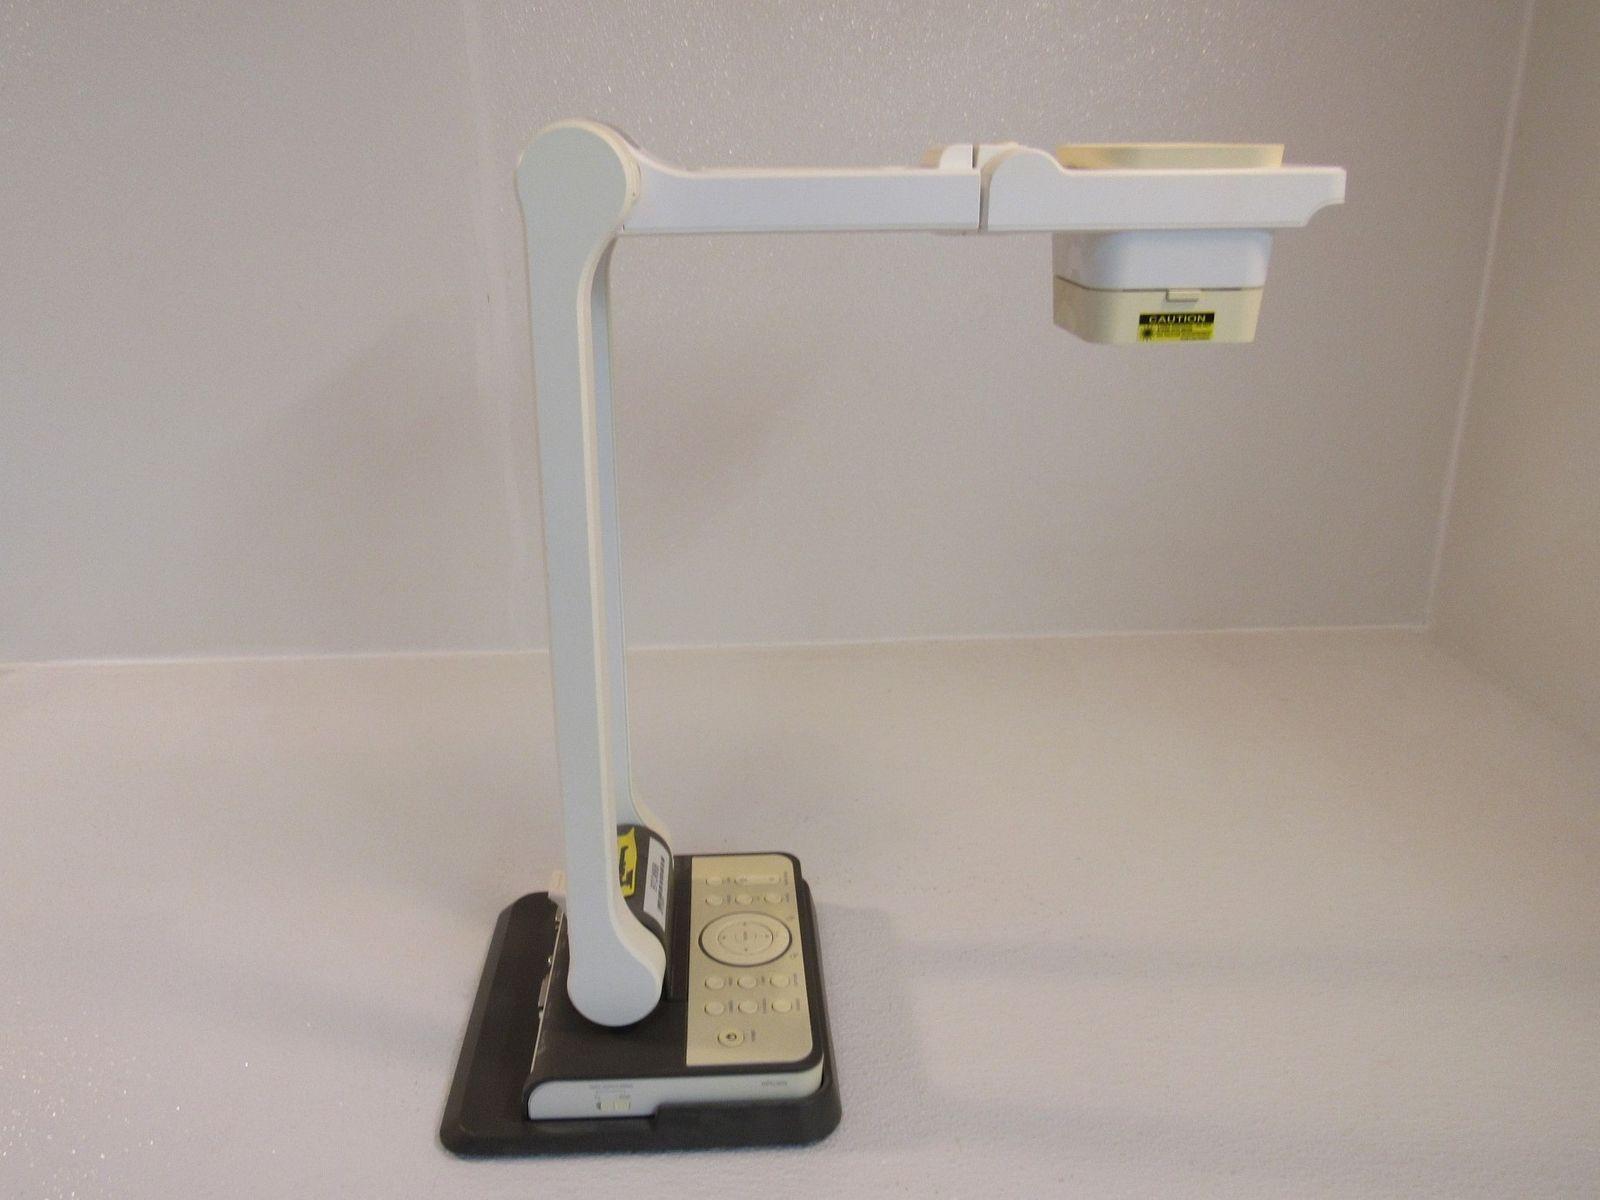 AverMedia AverVision Document Camera 3.2MP 3X Optical Zoom 2X Averzoom SPC300